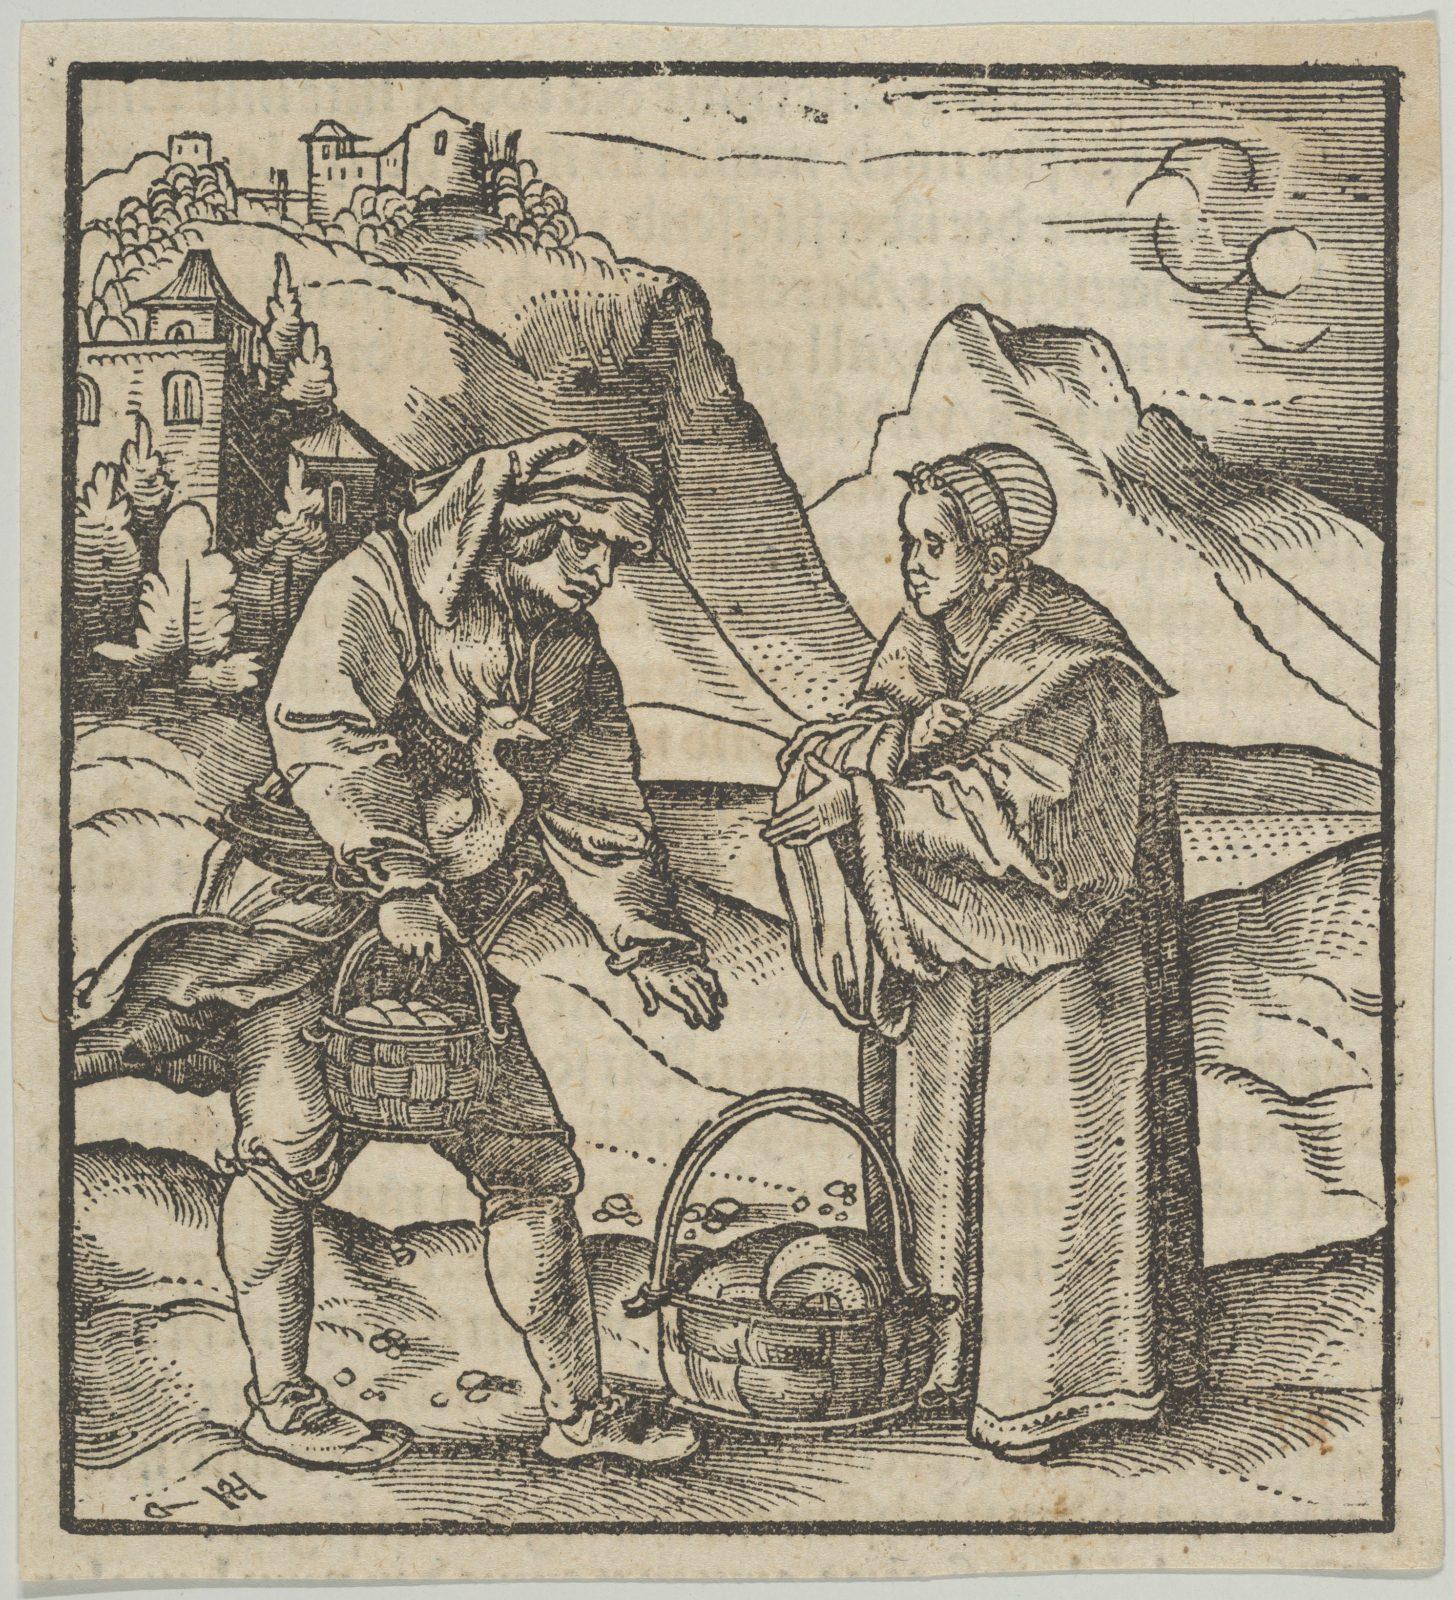 A Farmer and his Patron, from Hymmelwagen auff dem, wer wol lebt...